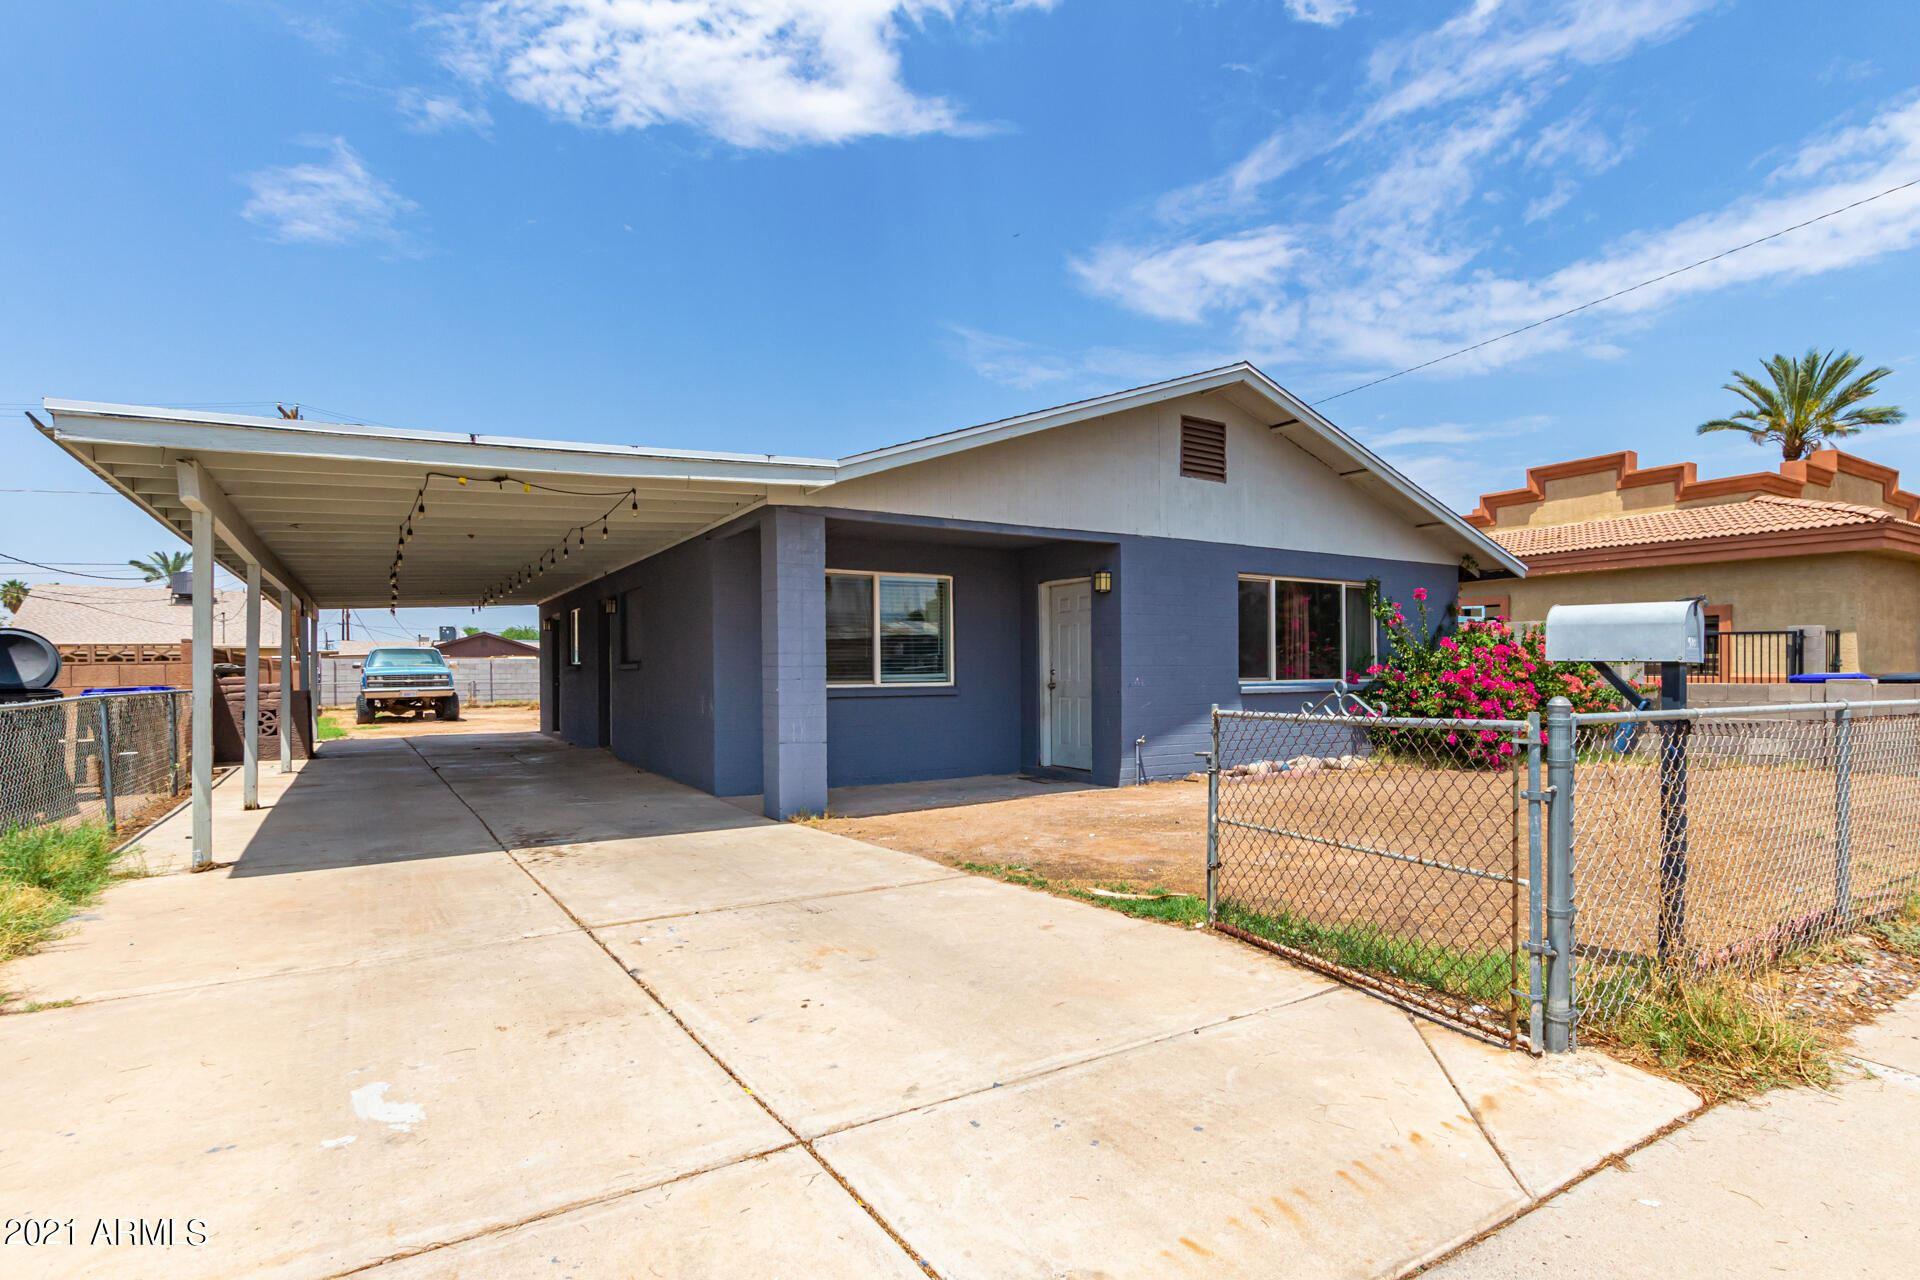 Photo of 9104 W MCKINLEY Street, Tolleson, AZ 85353 (MLS # 6264333)